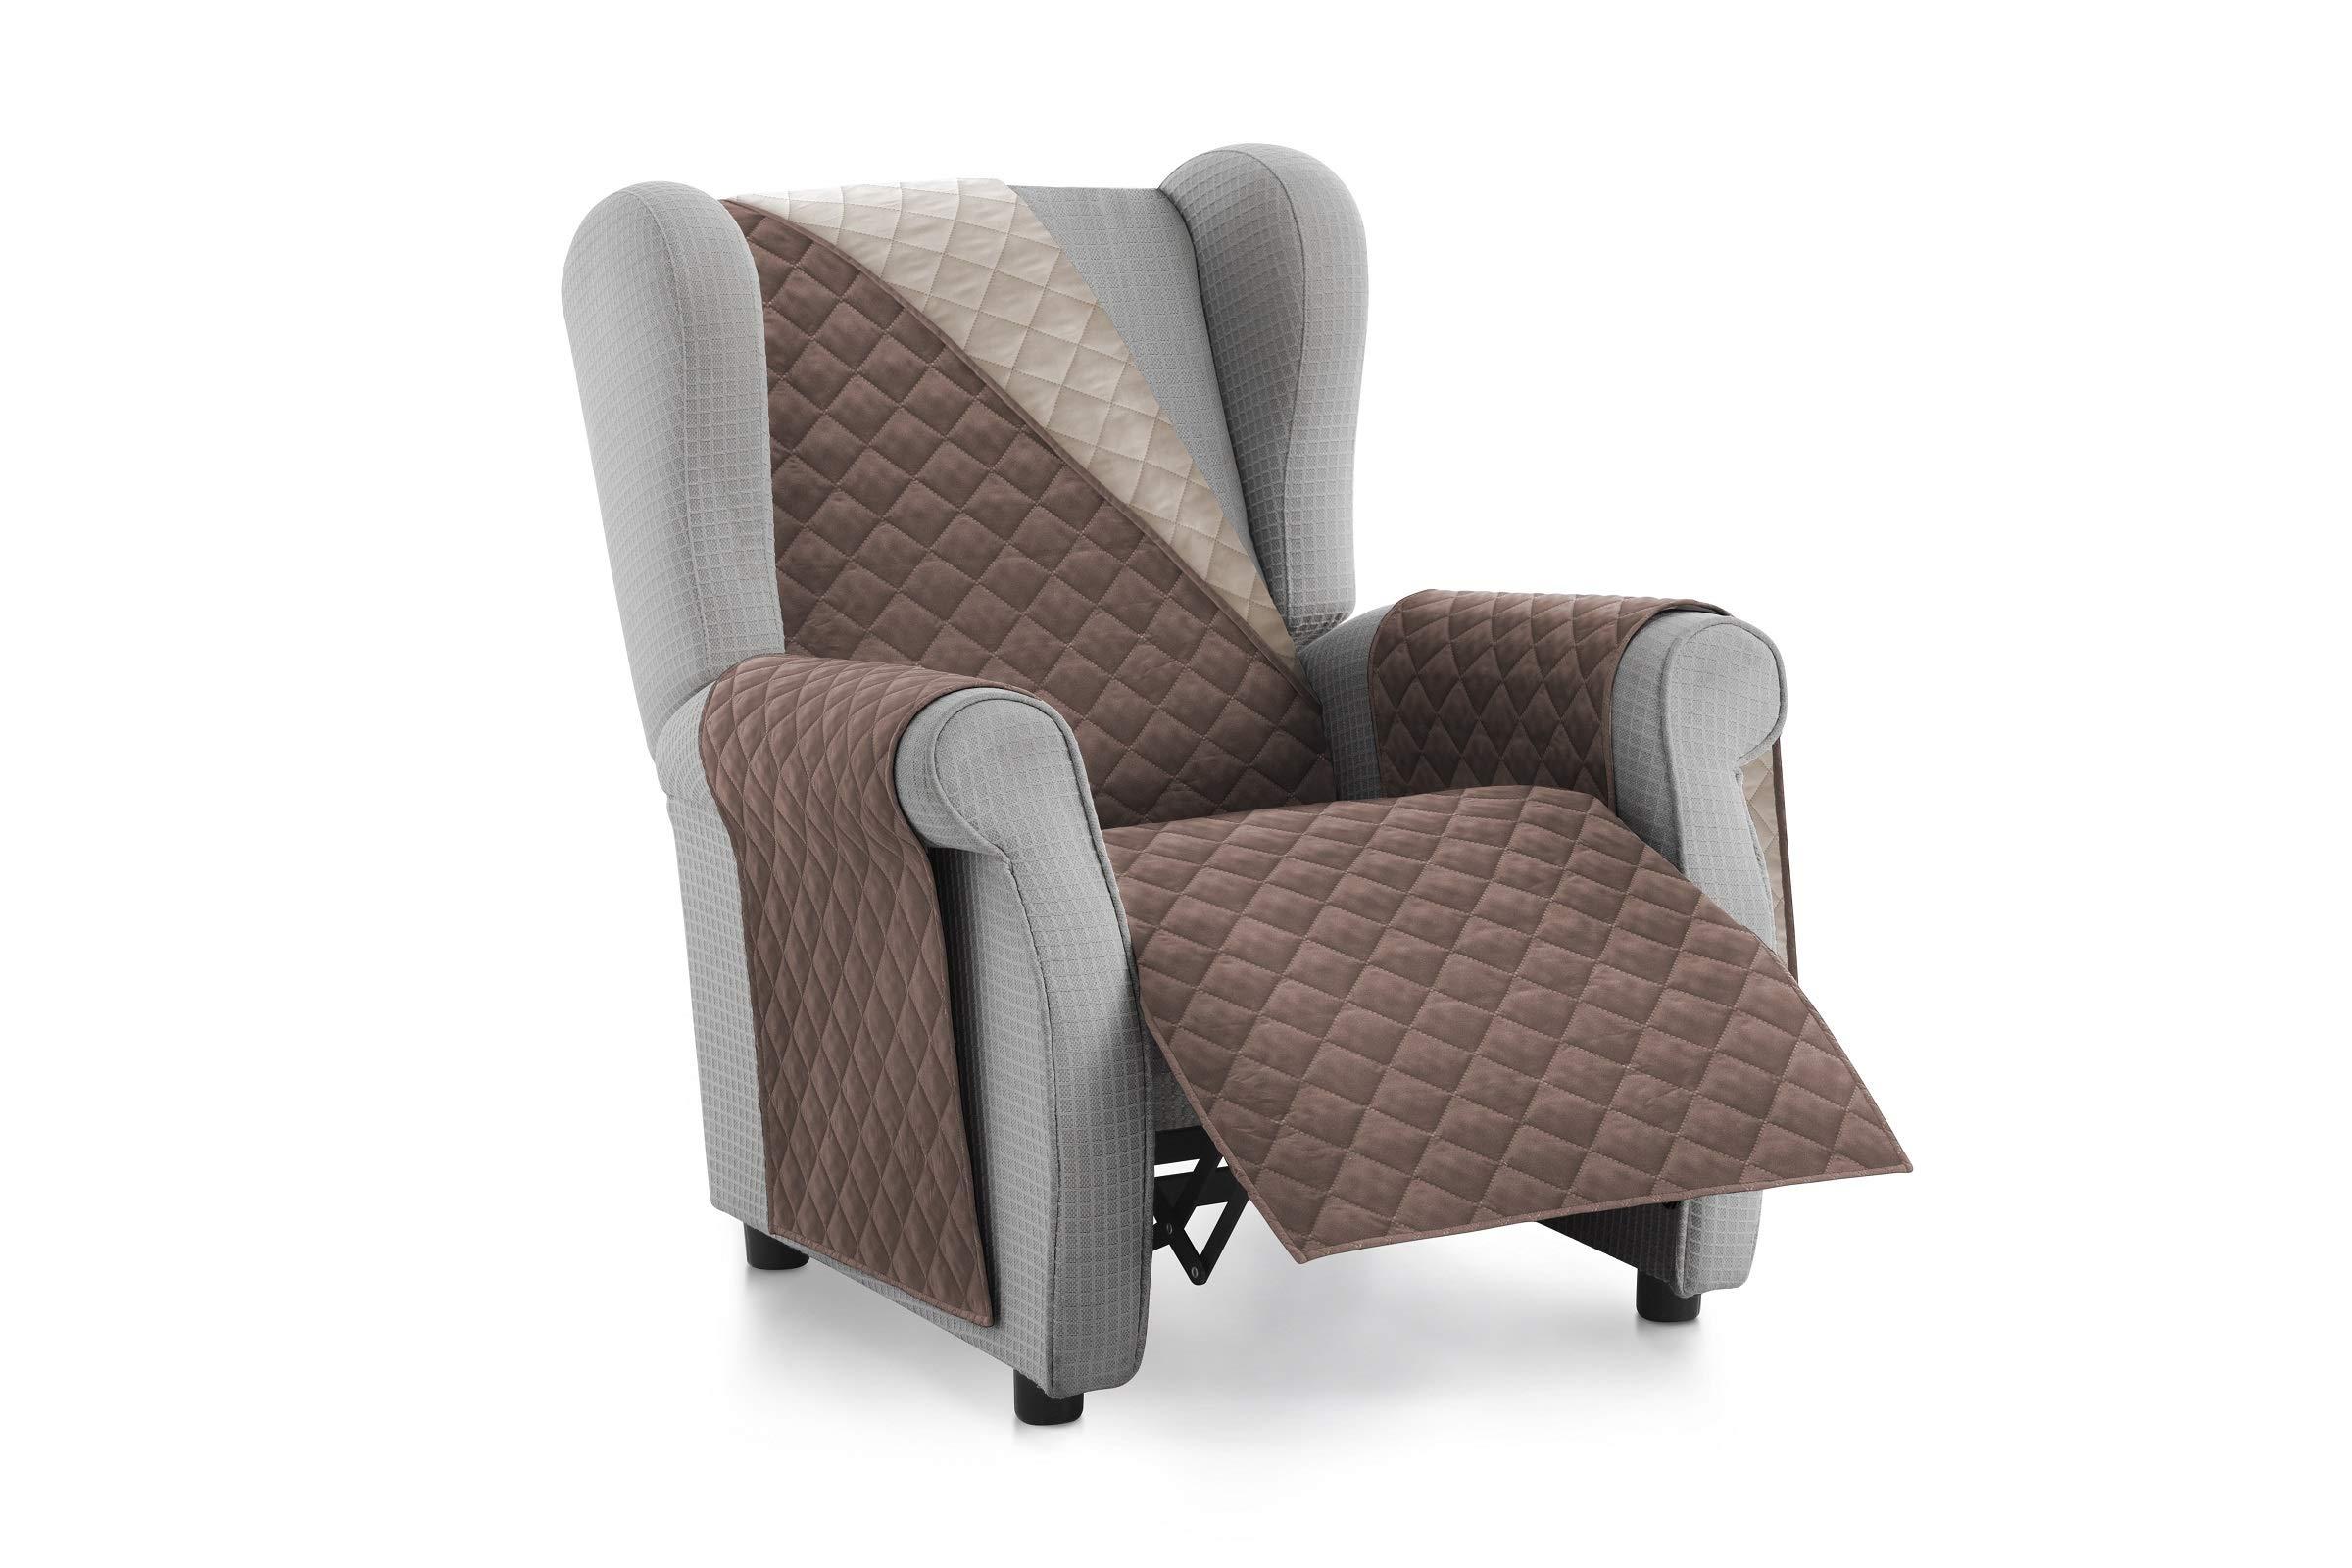 Textilhome - Funda Cubre Sofá Malu -1 Plaza - Relax - Protector para Sofás Acolchado